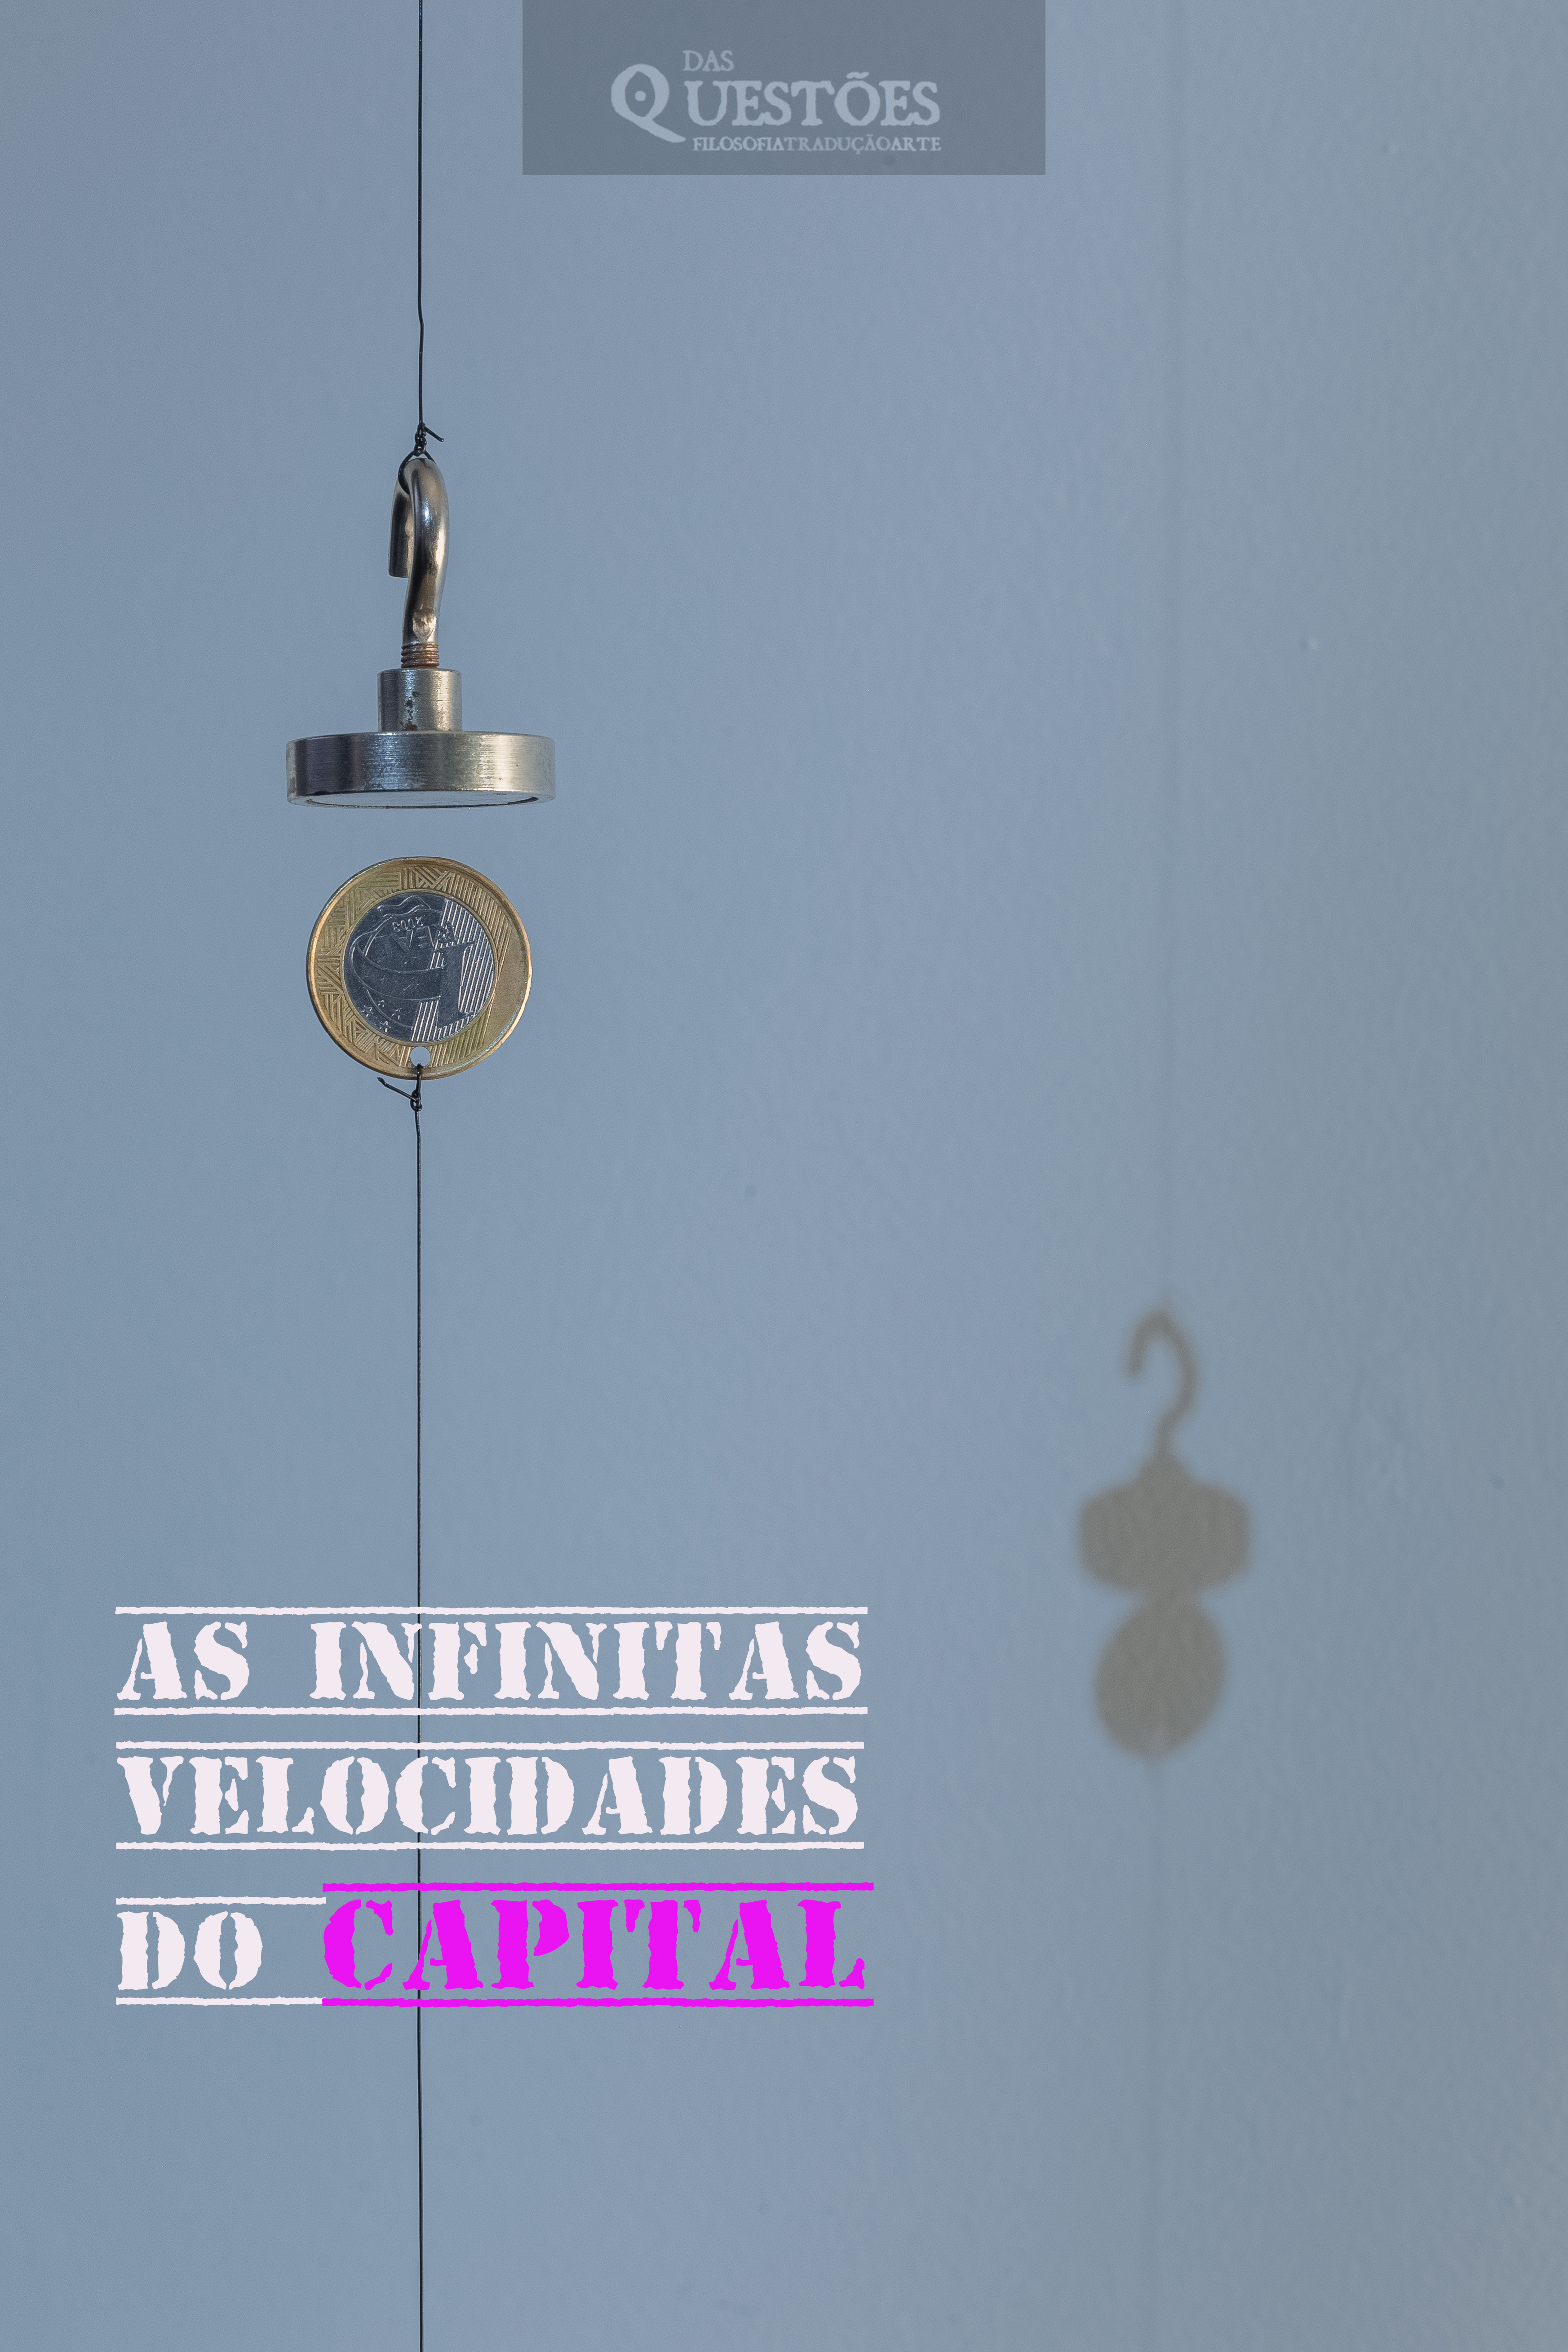 Visualizar v. 12 n. 1 (2021): As velocidades infinitas do Capital